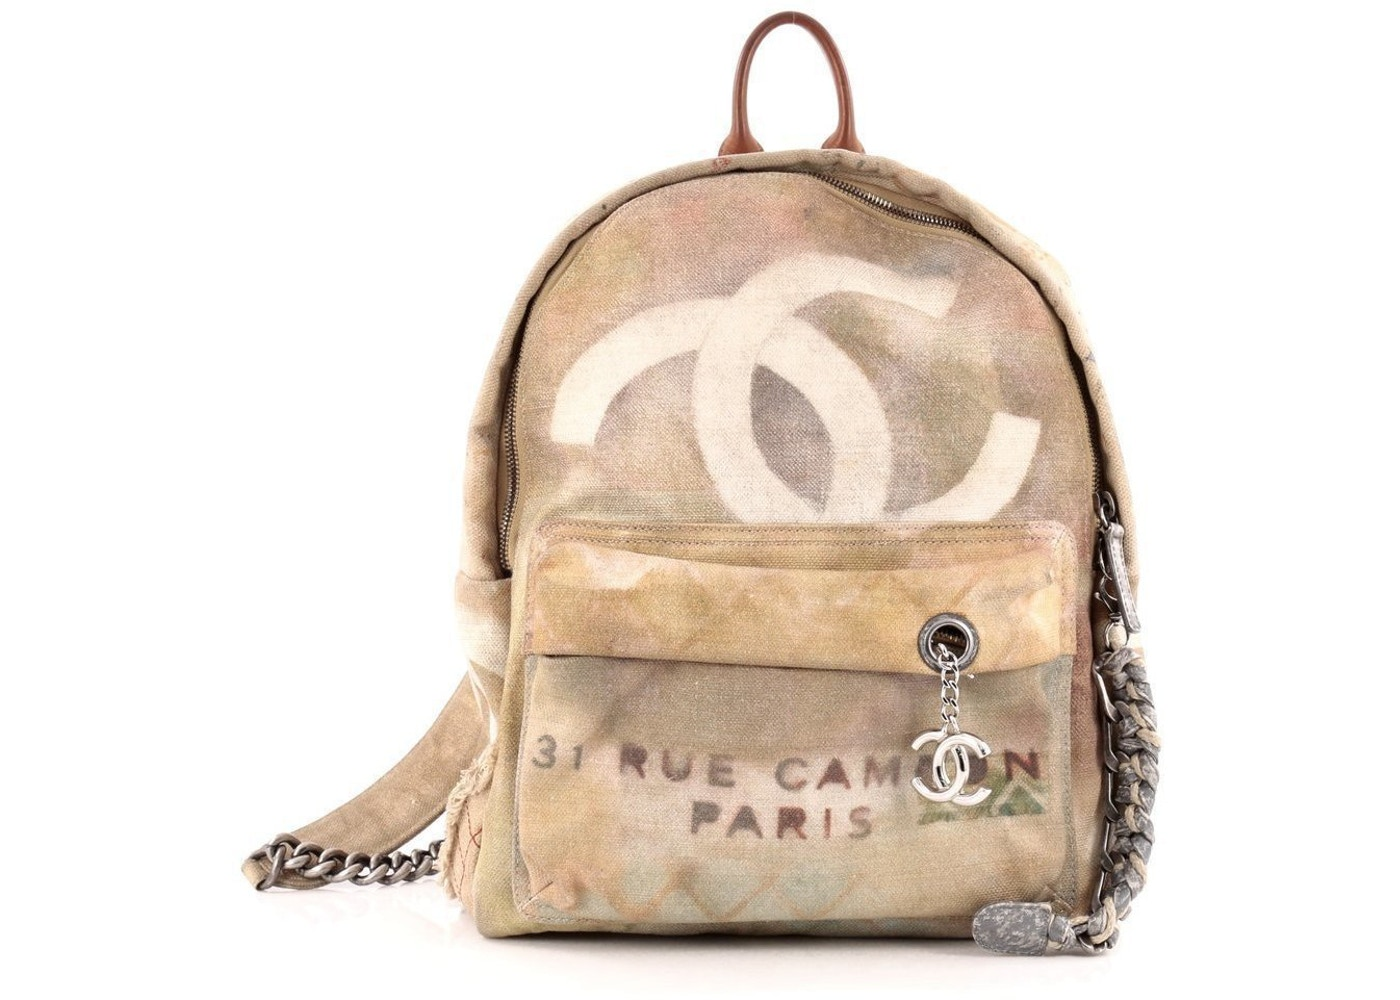 Chanel Art School Backpack Graffiti Small Tan